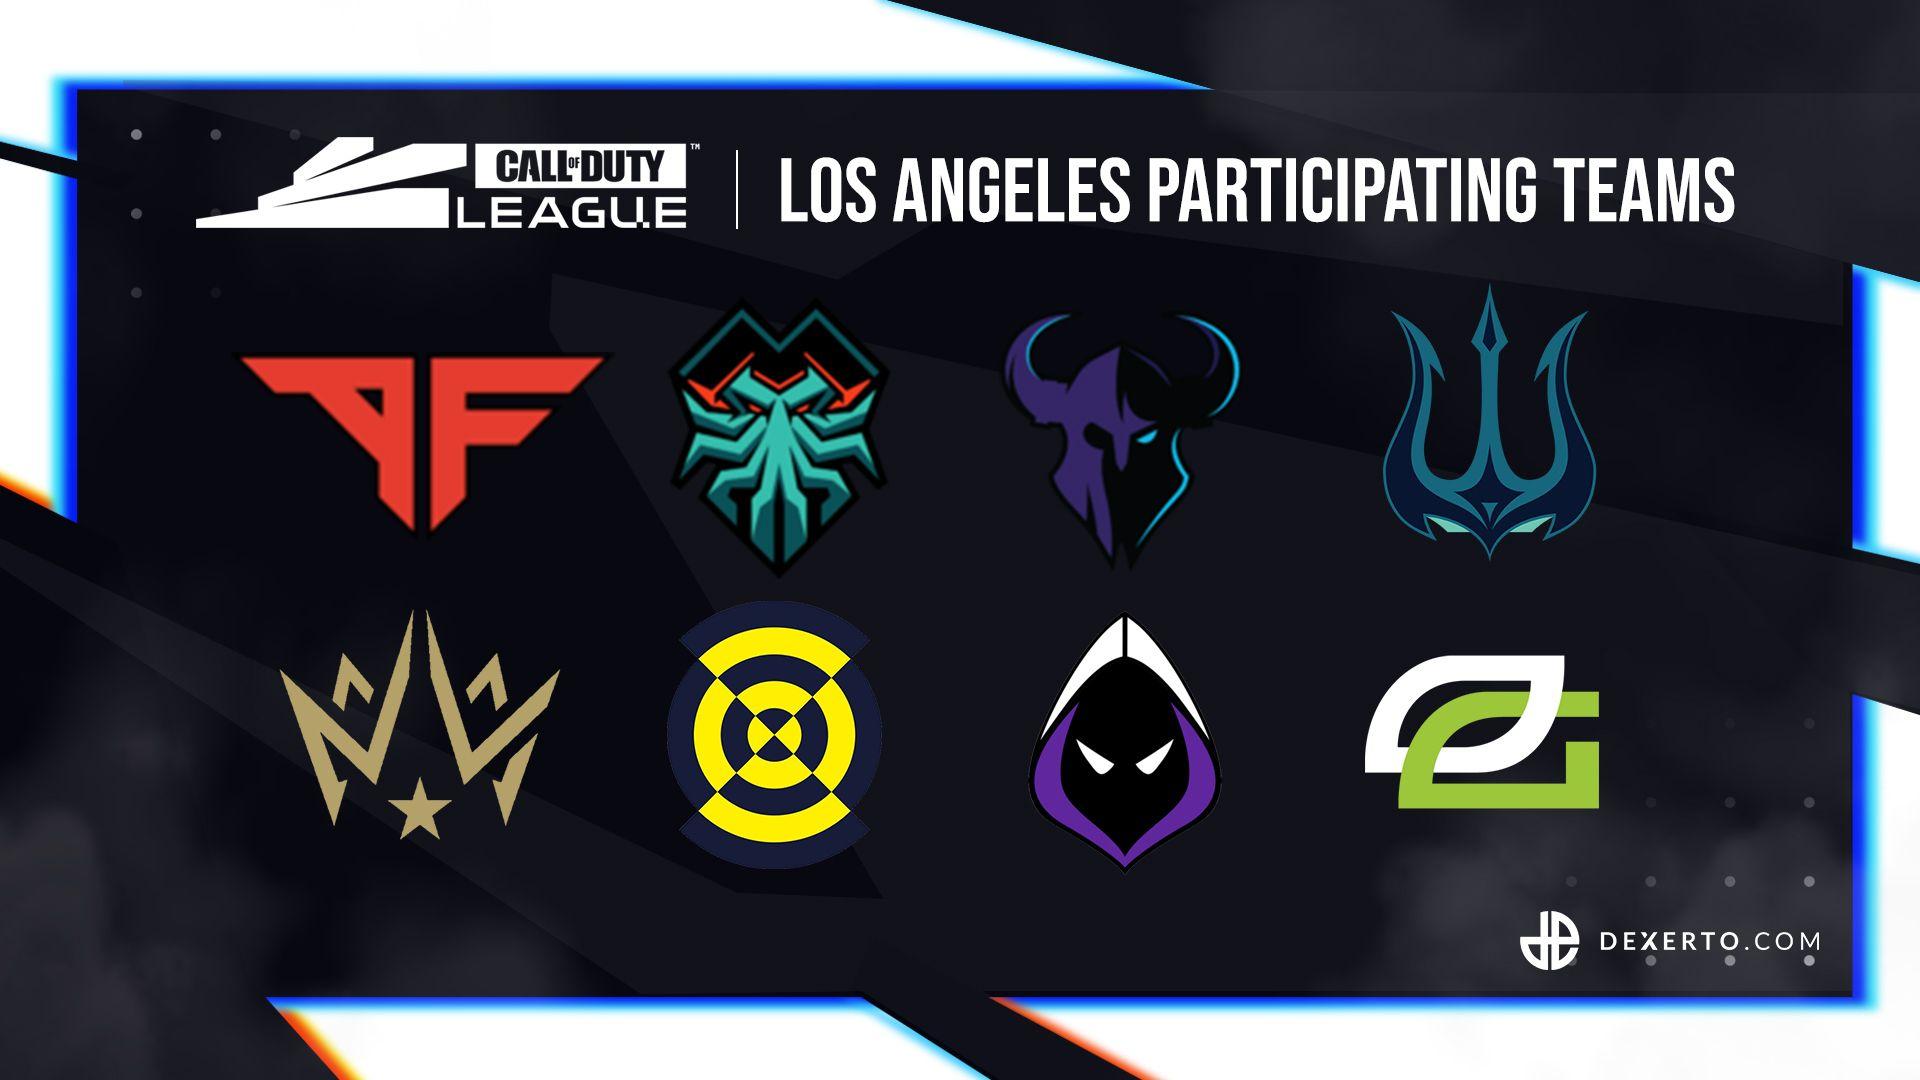 CDL Los Angeles